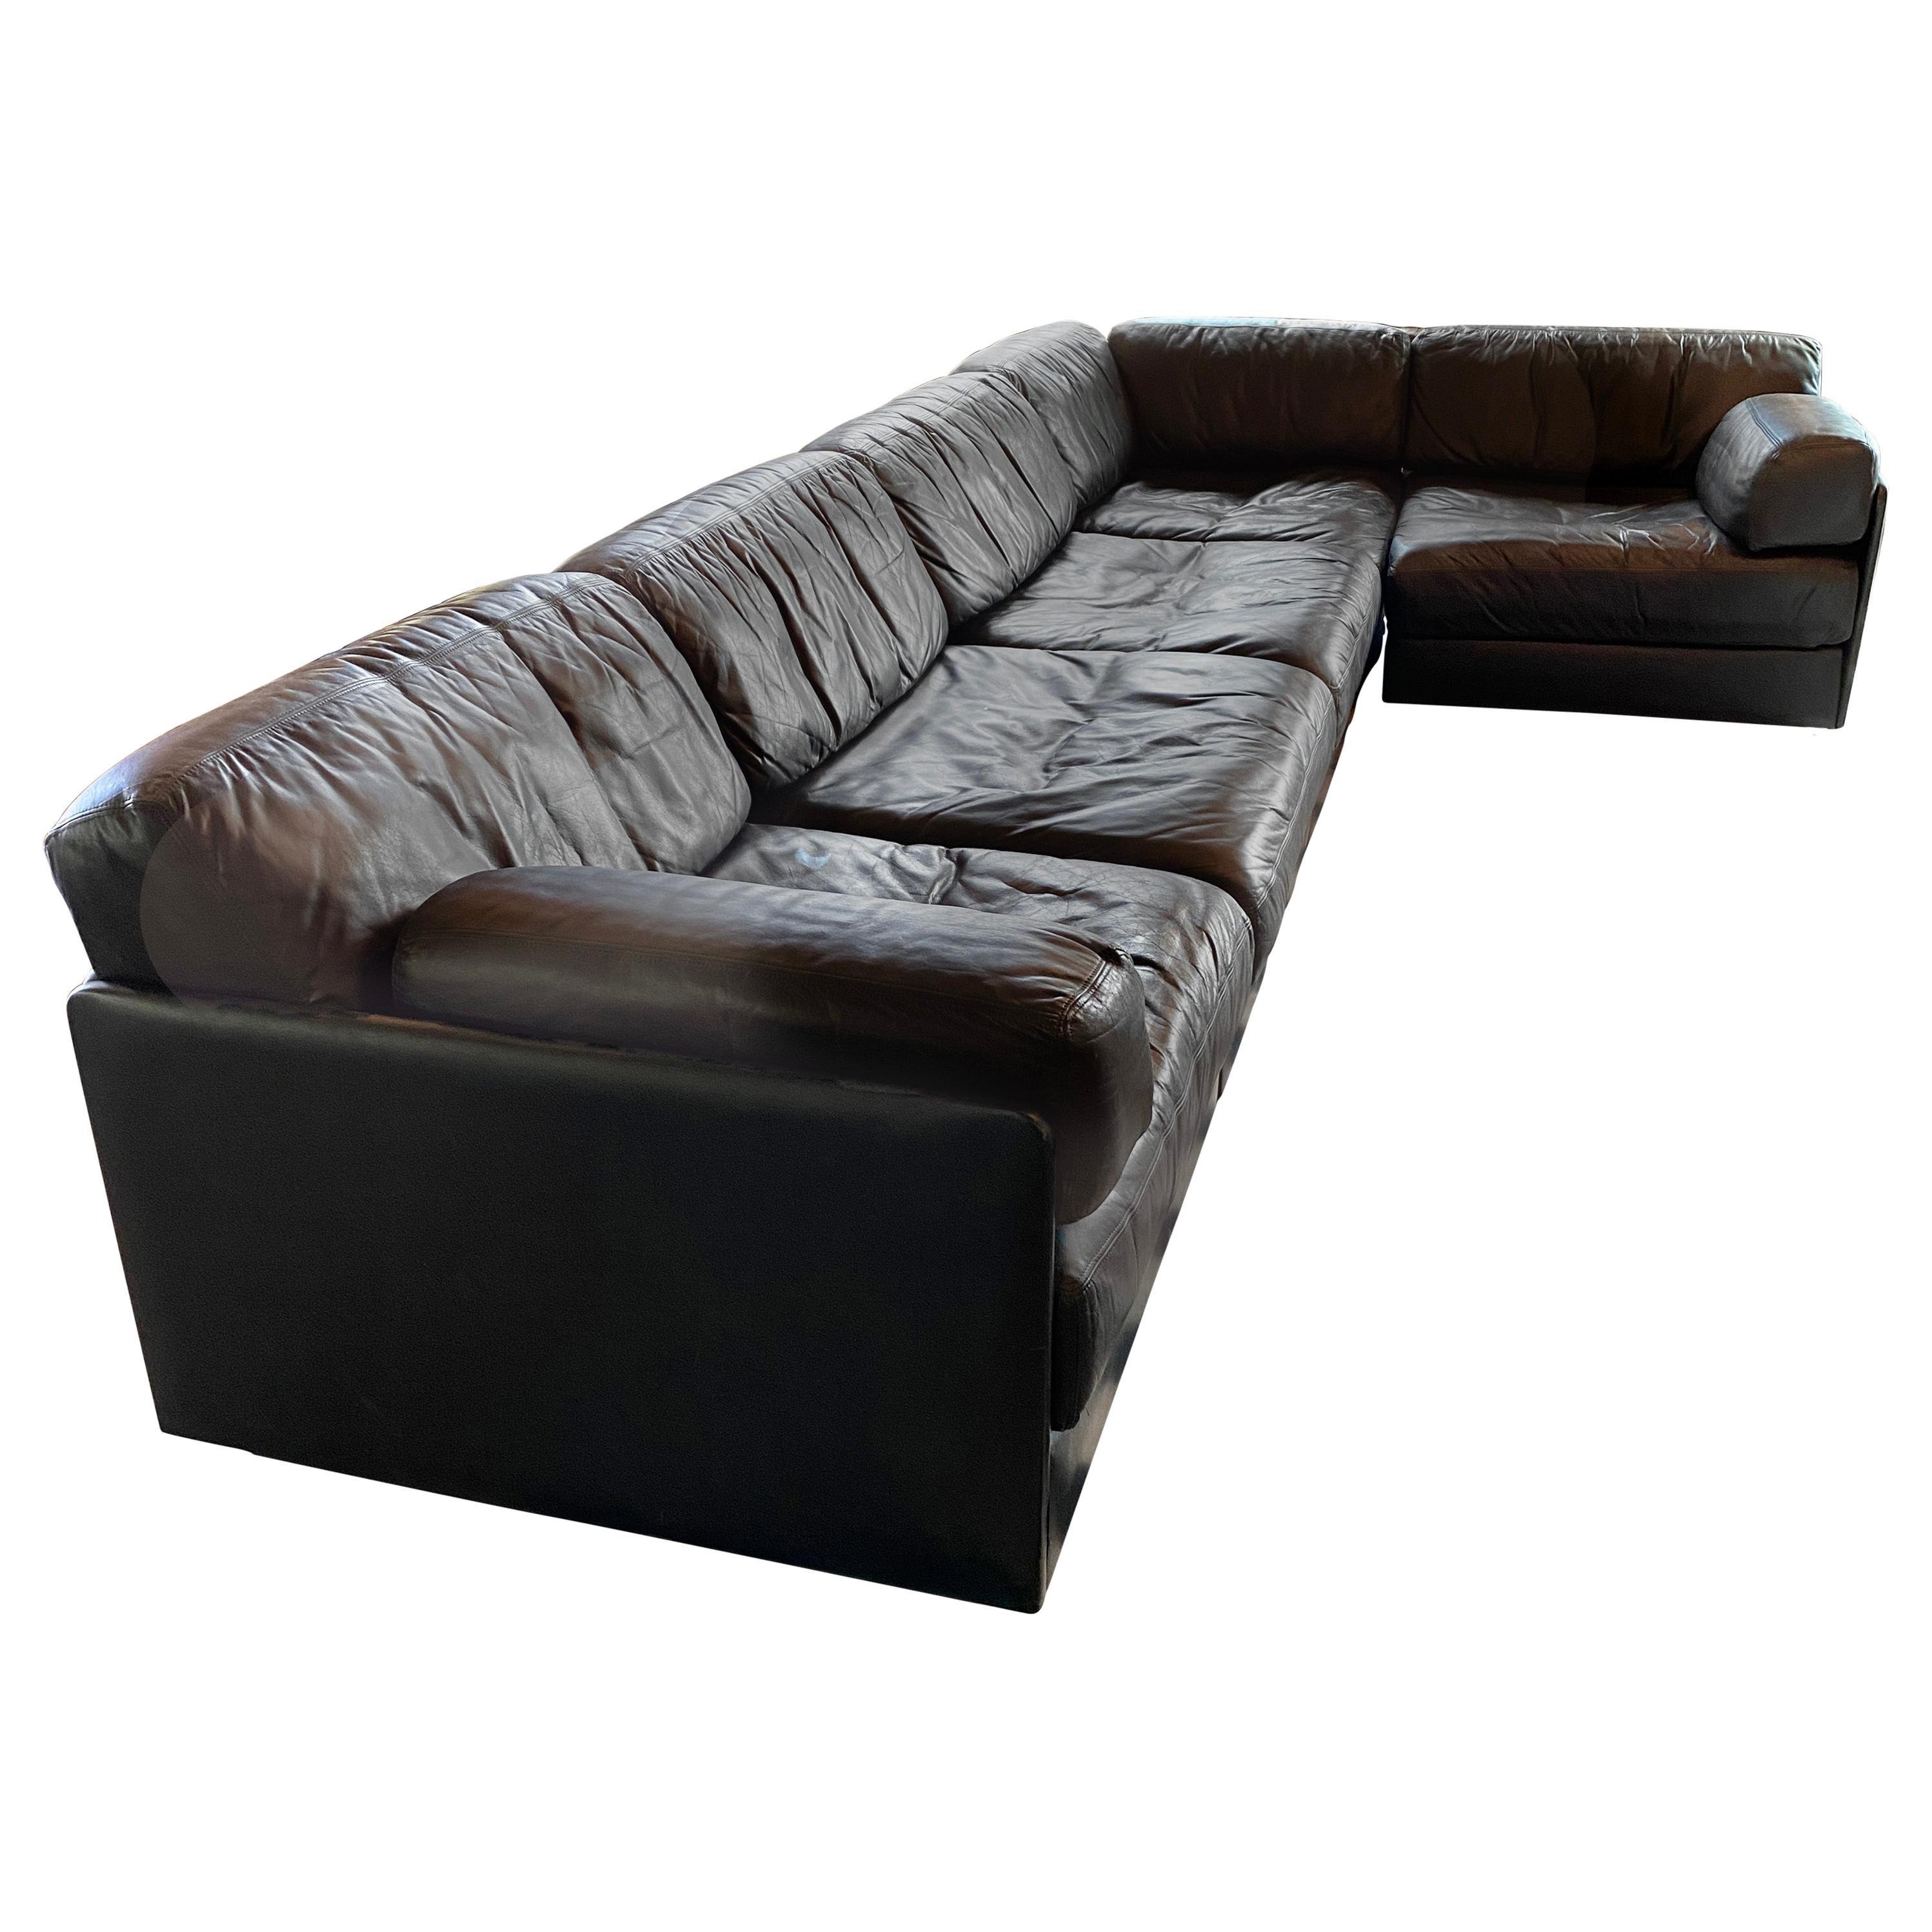 Modular De Sede Sectional Sofa DS-76, 1970s